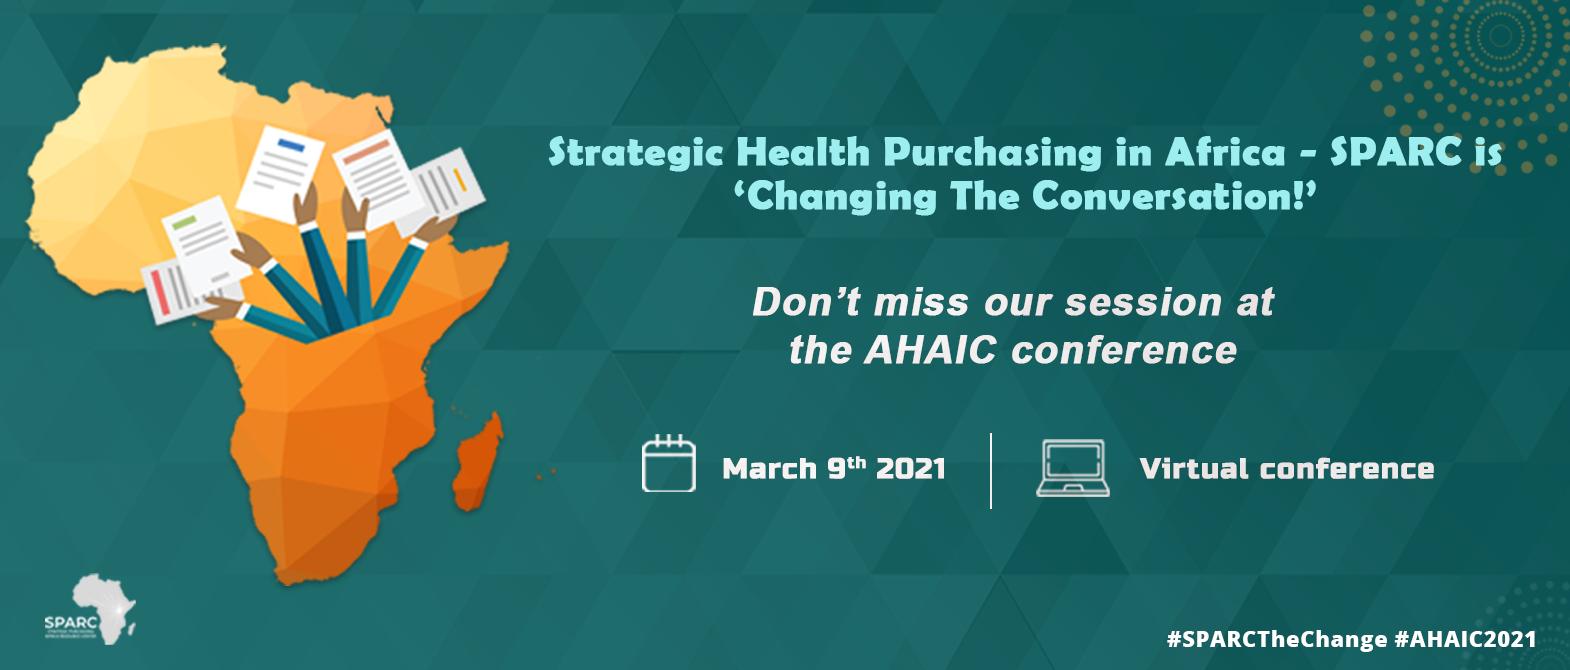 SPARC at AHAIC 2021 Virtual Conference